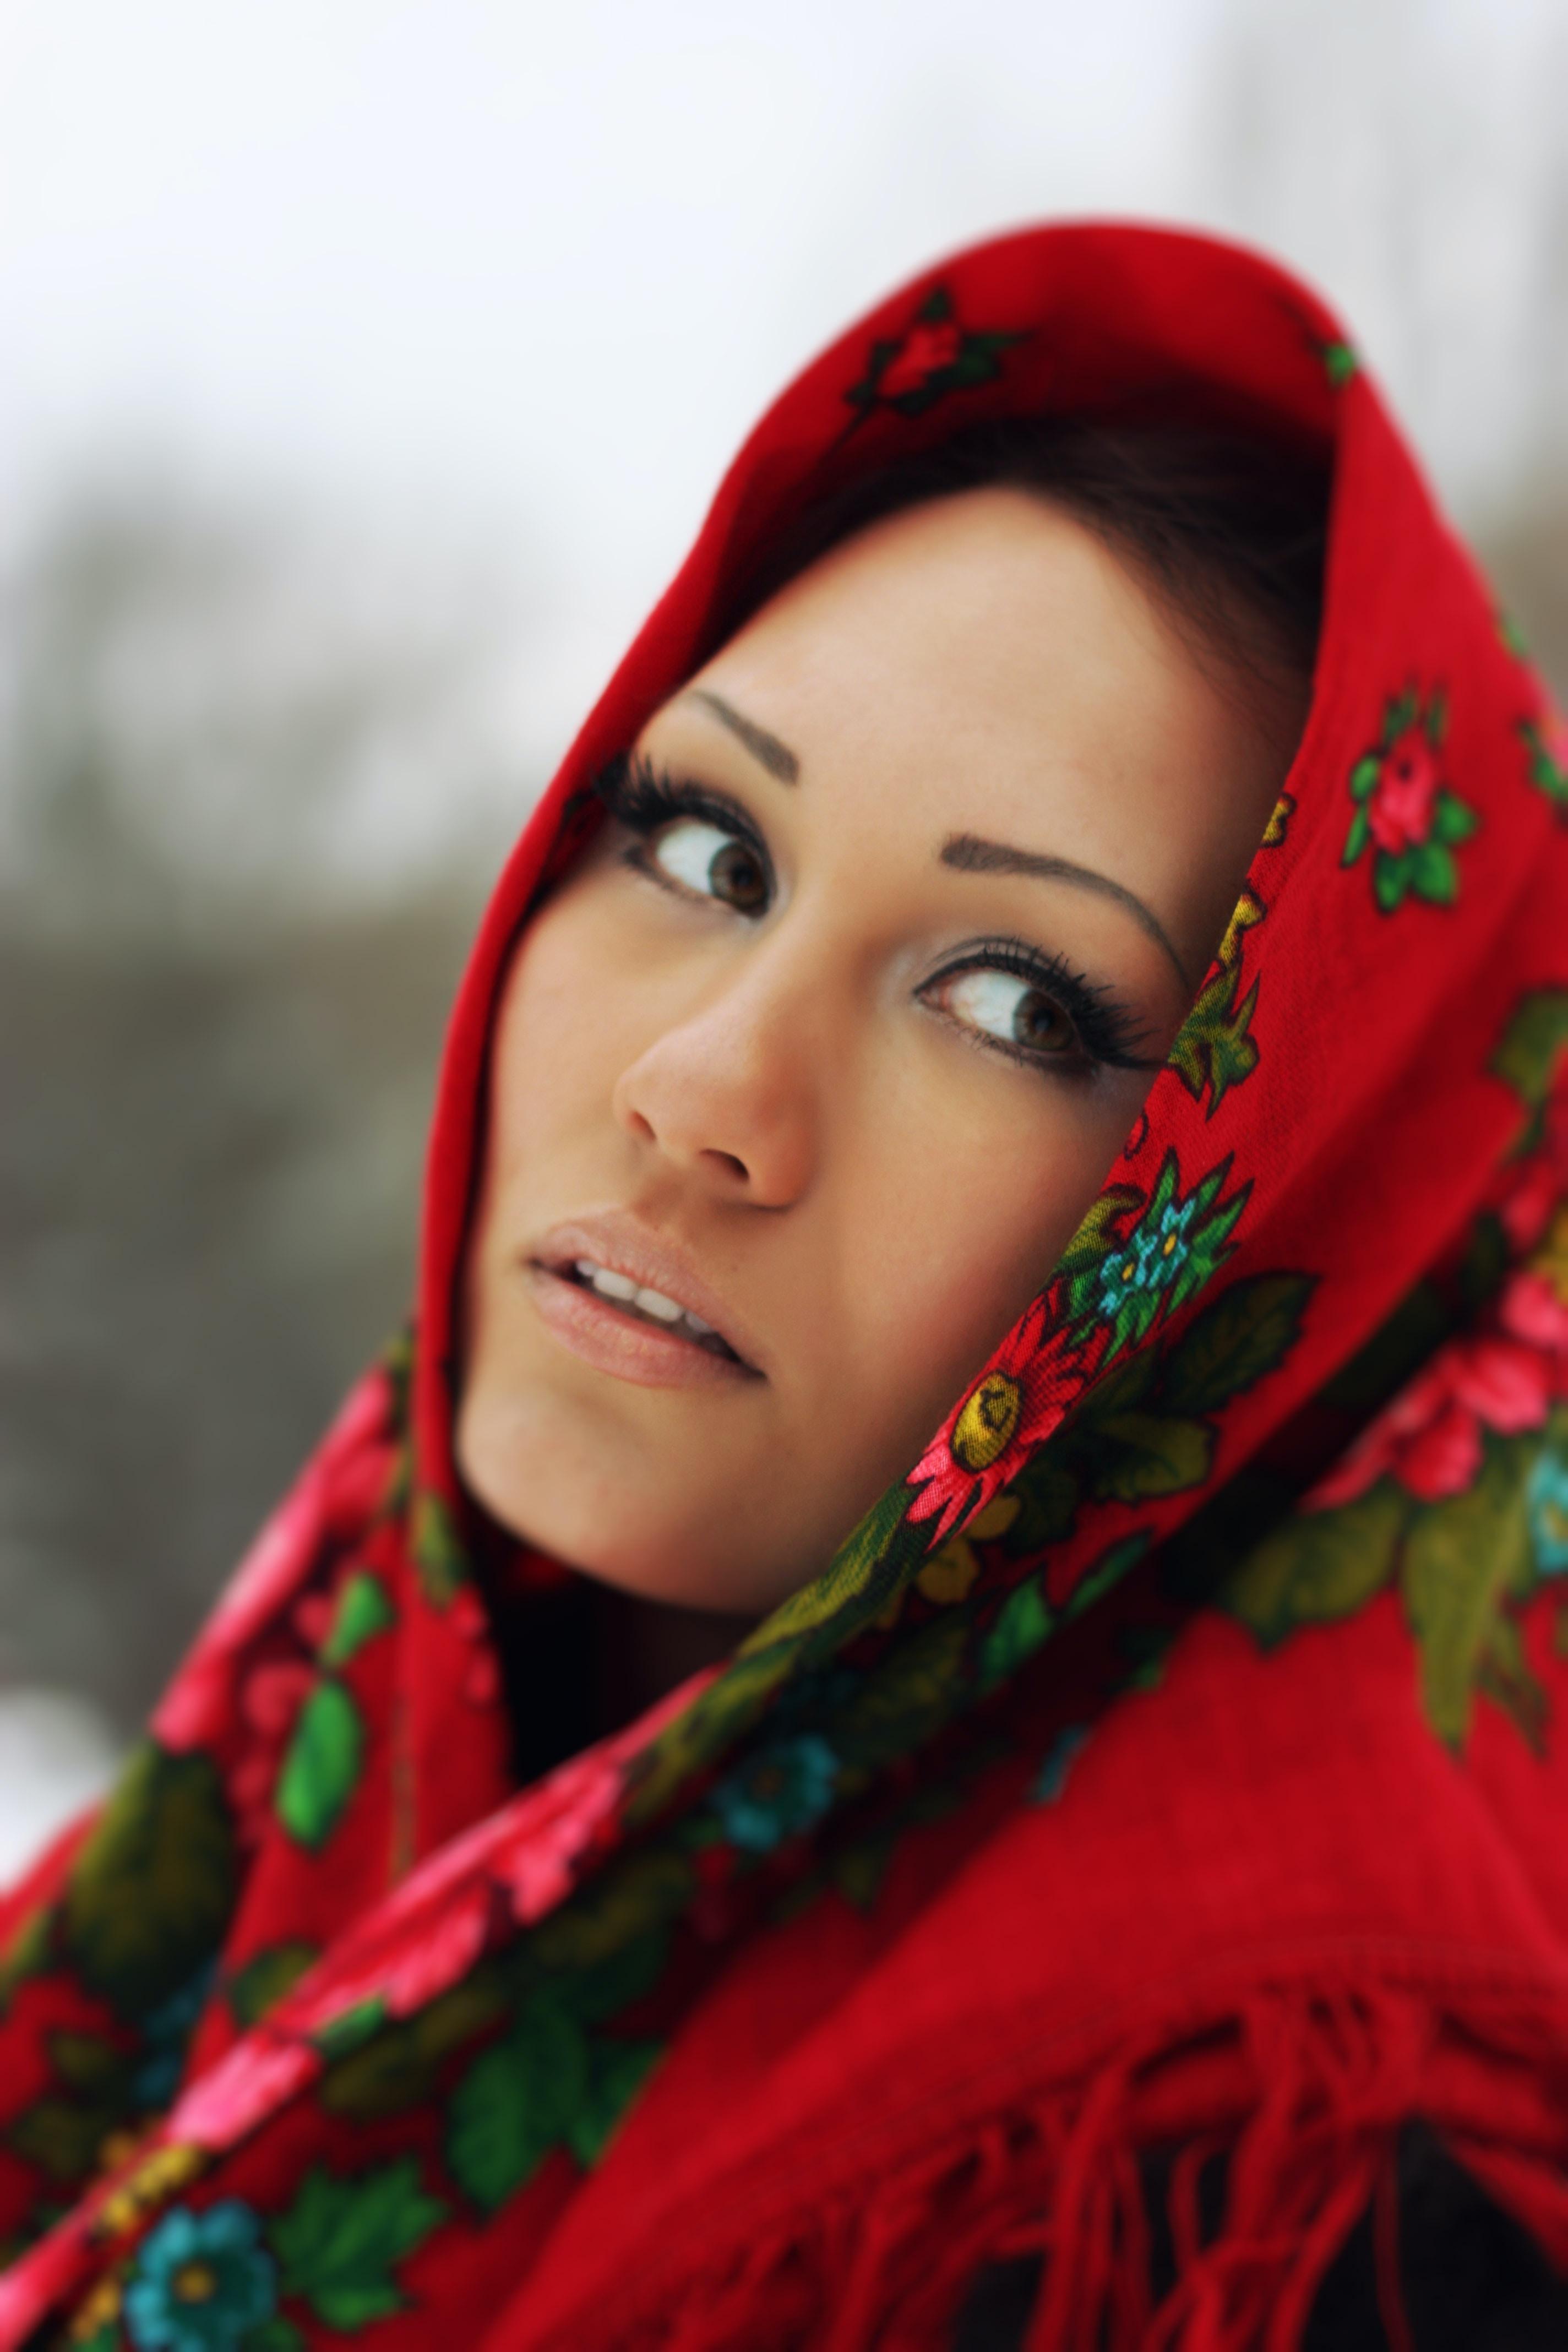 woman's facing sideways